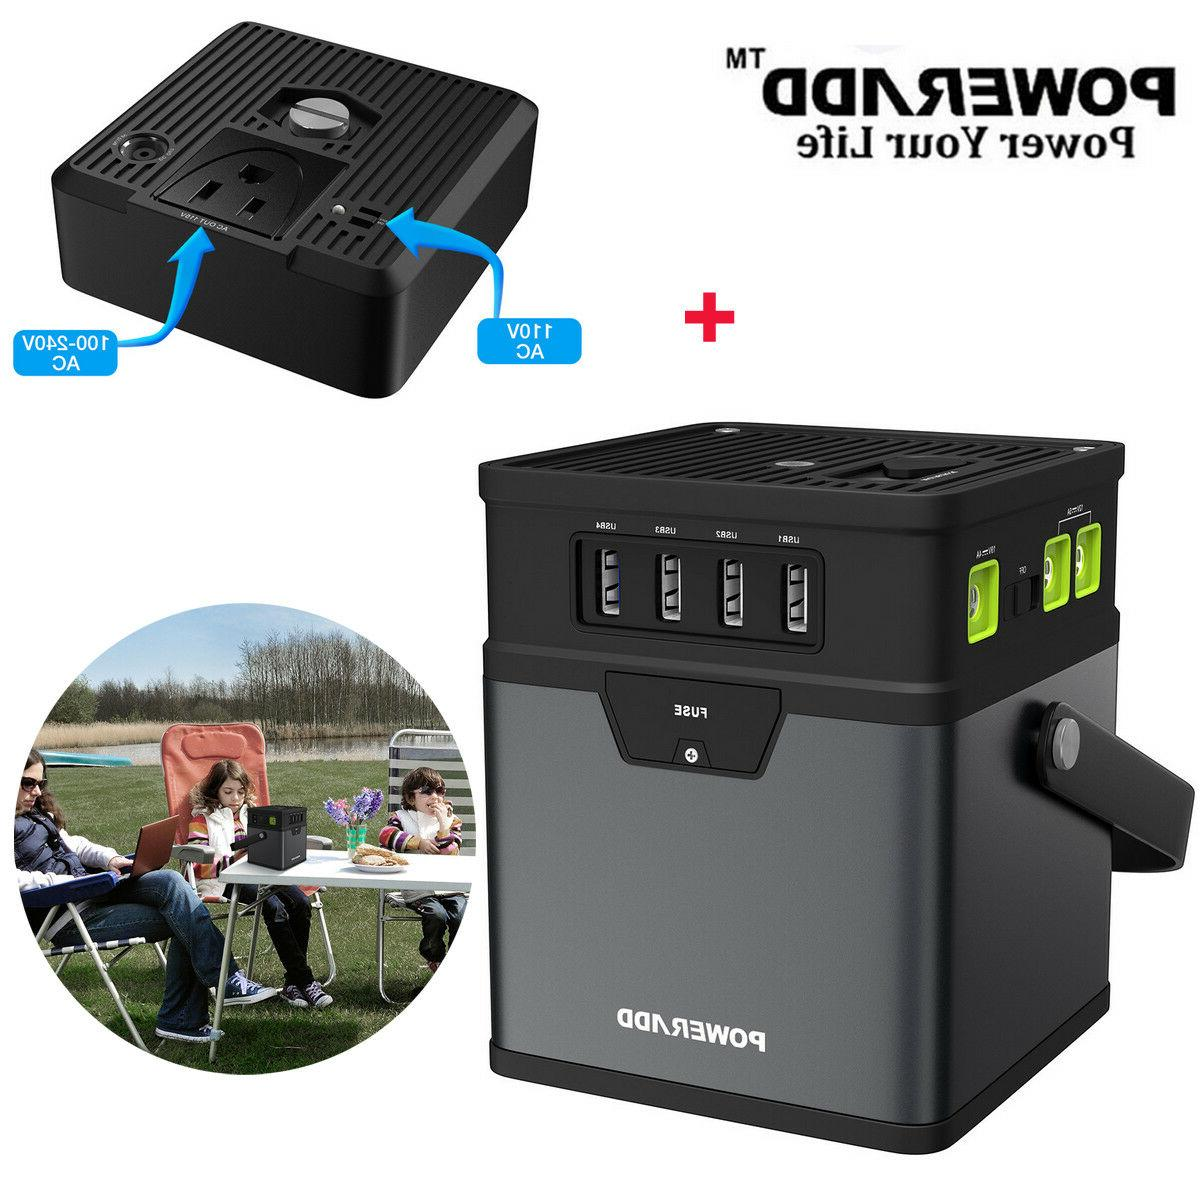 Poweradd 50000mAh Portable Generator DC/AC Power Inverter wi